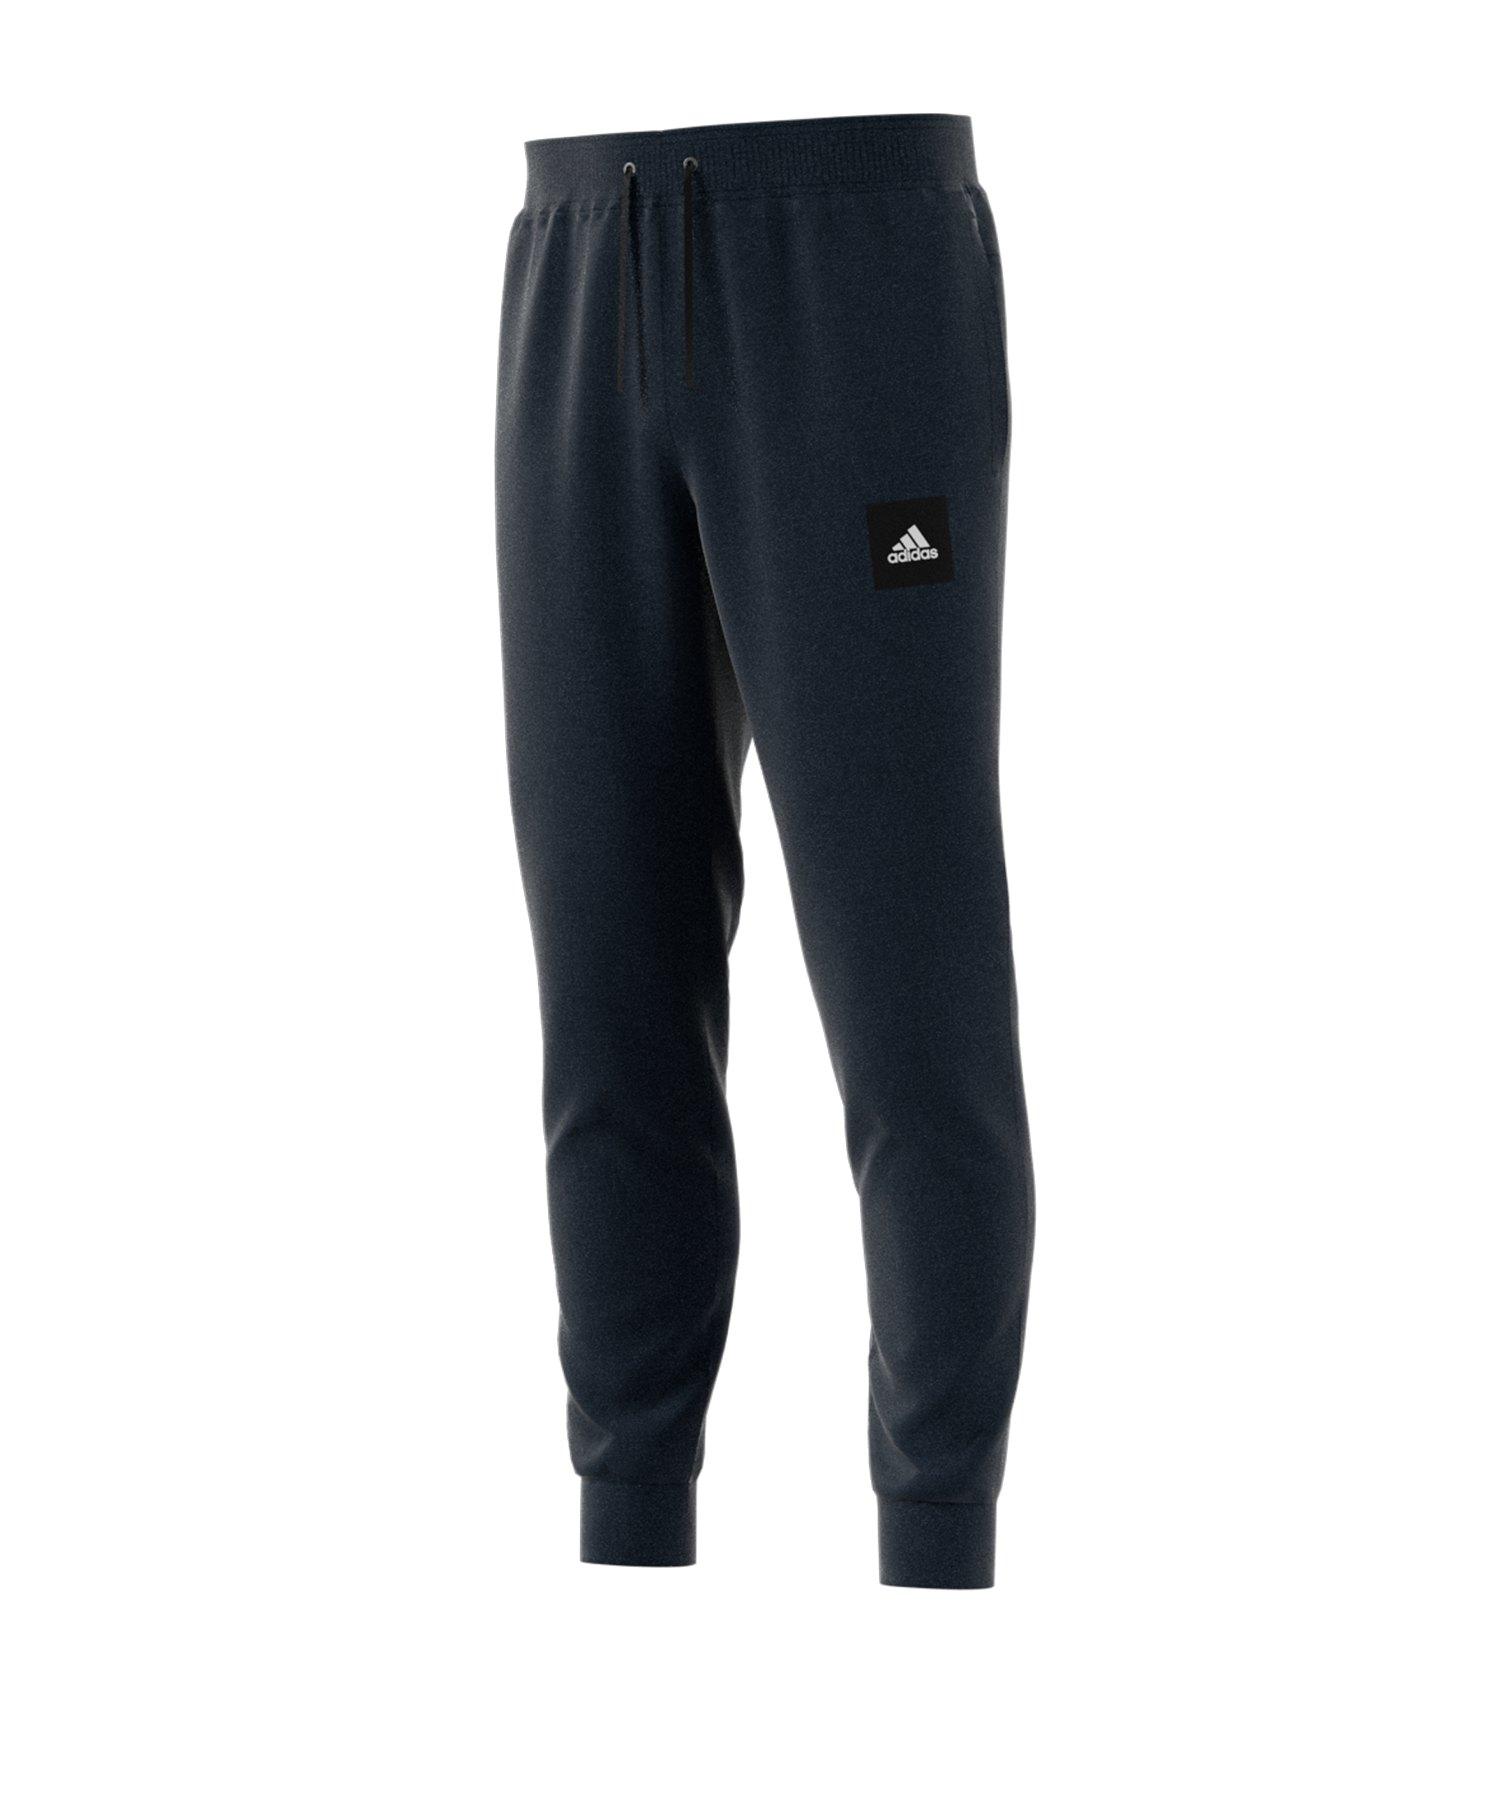 adidas Must Haves Pant Hose Blau - schwarz